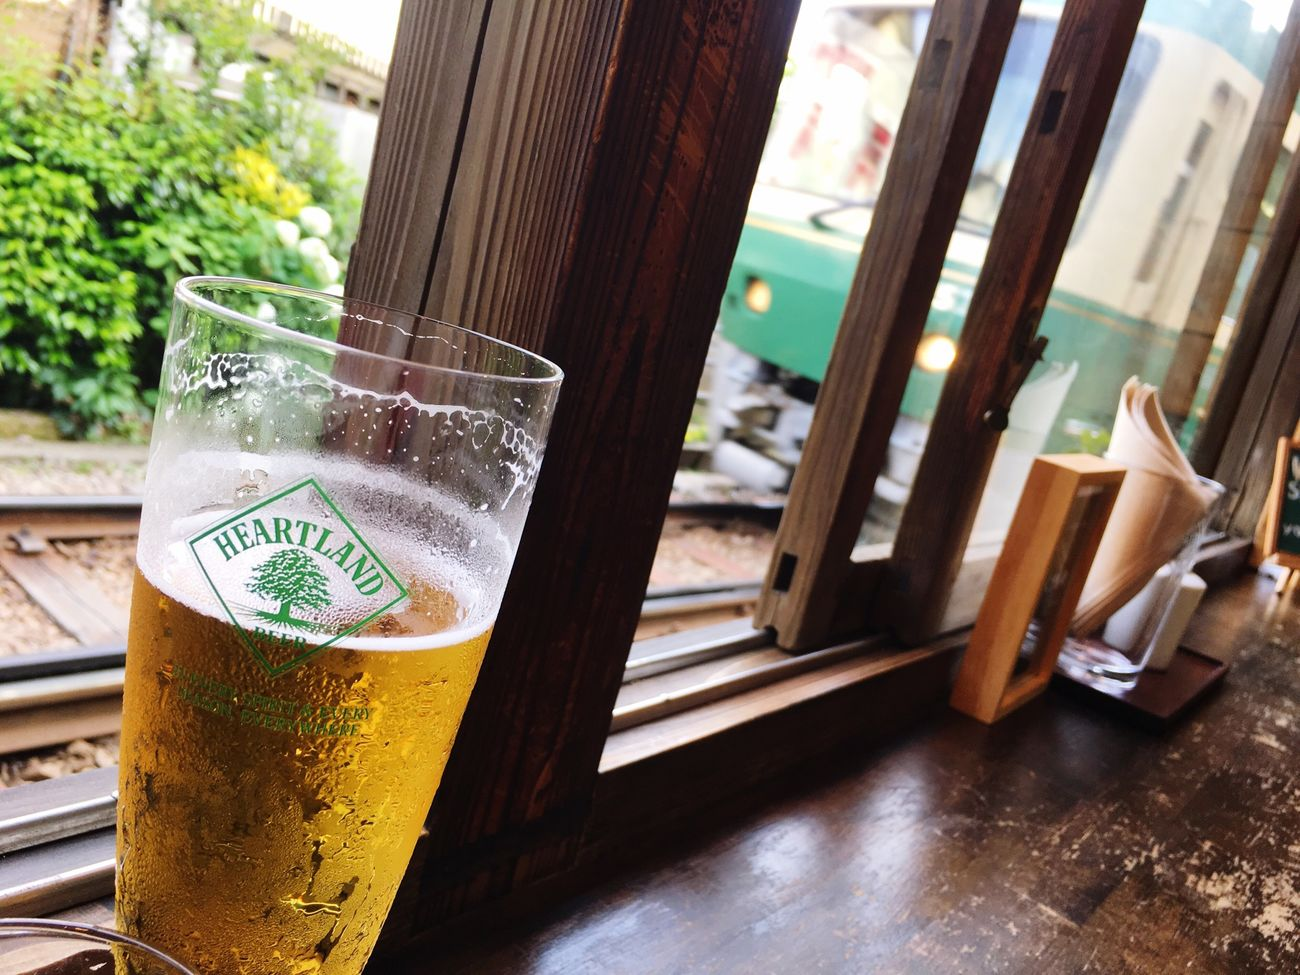 Kamakura Enoden 江ノ電 鎌倉 Cycling Beer